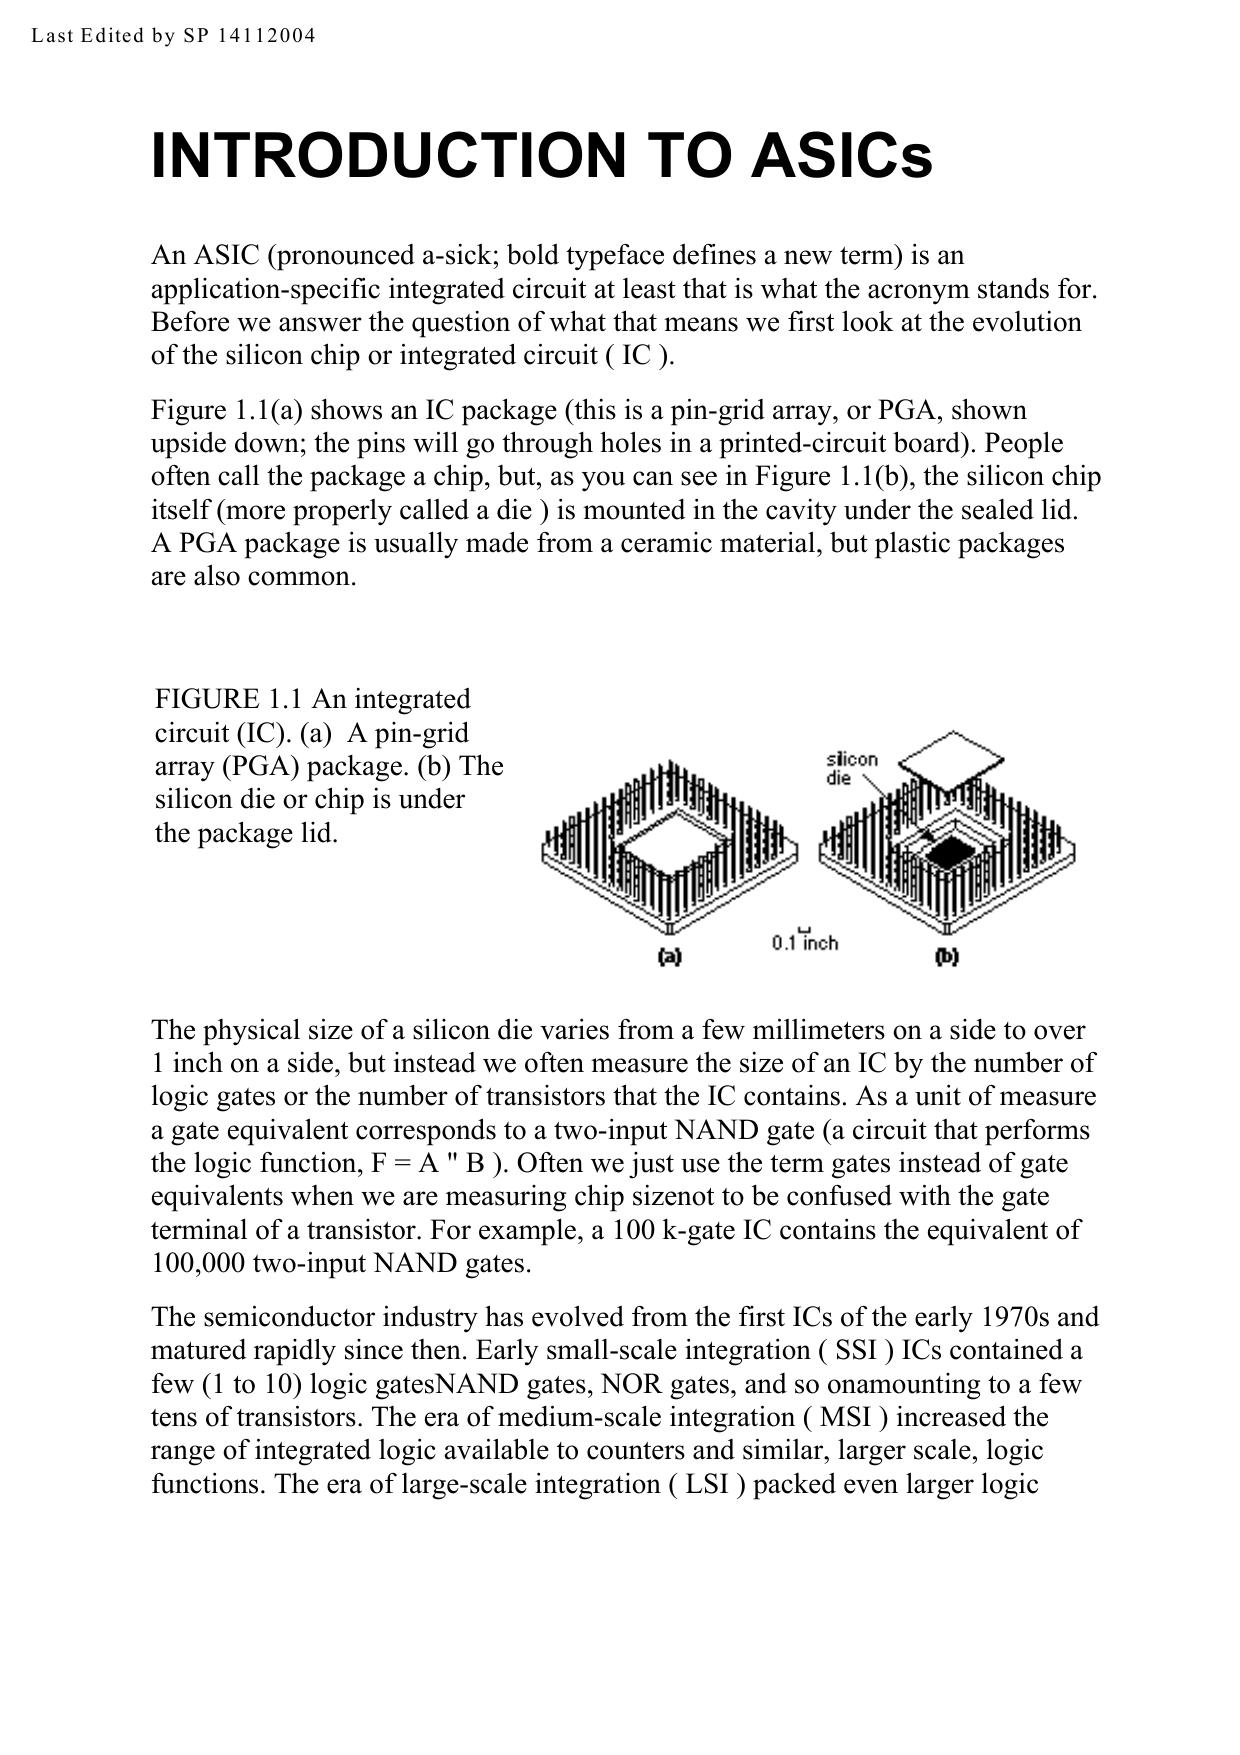 Asics The Website 62 Adder Block Diagram Abbreviation Fa Stands For Fulladder